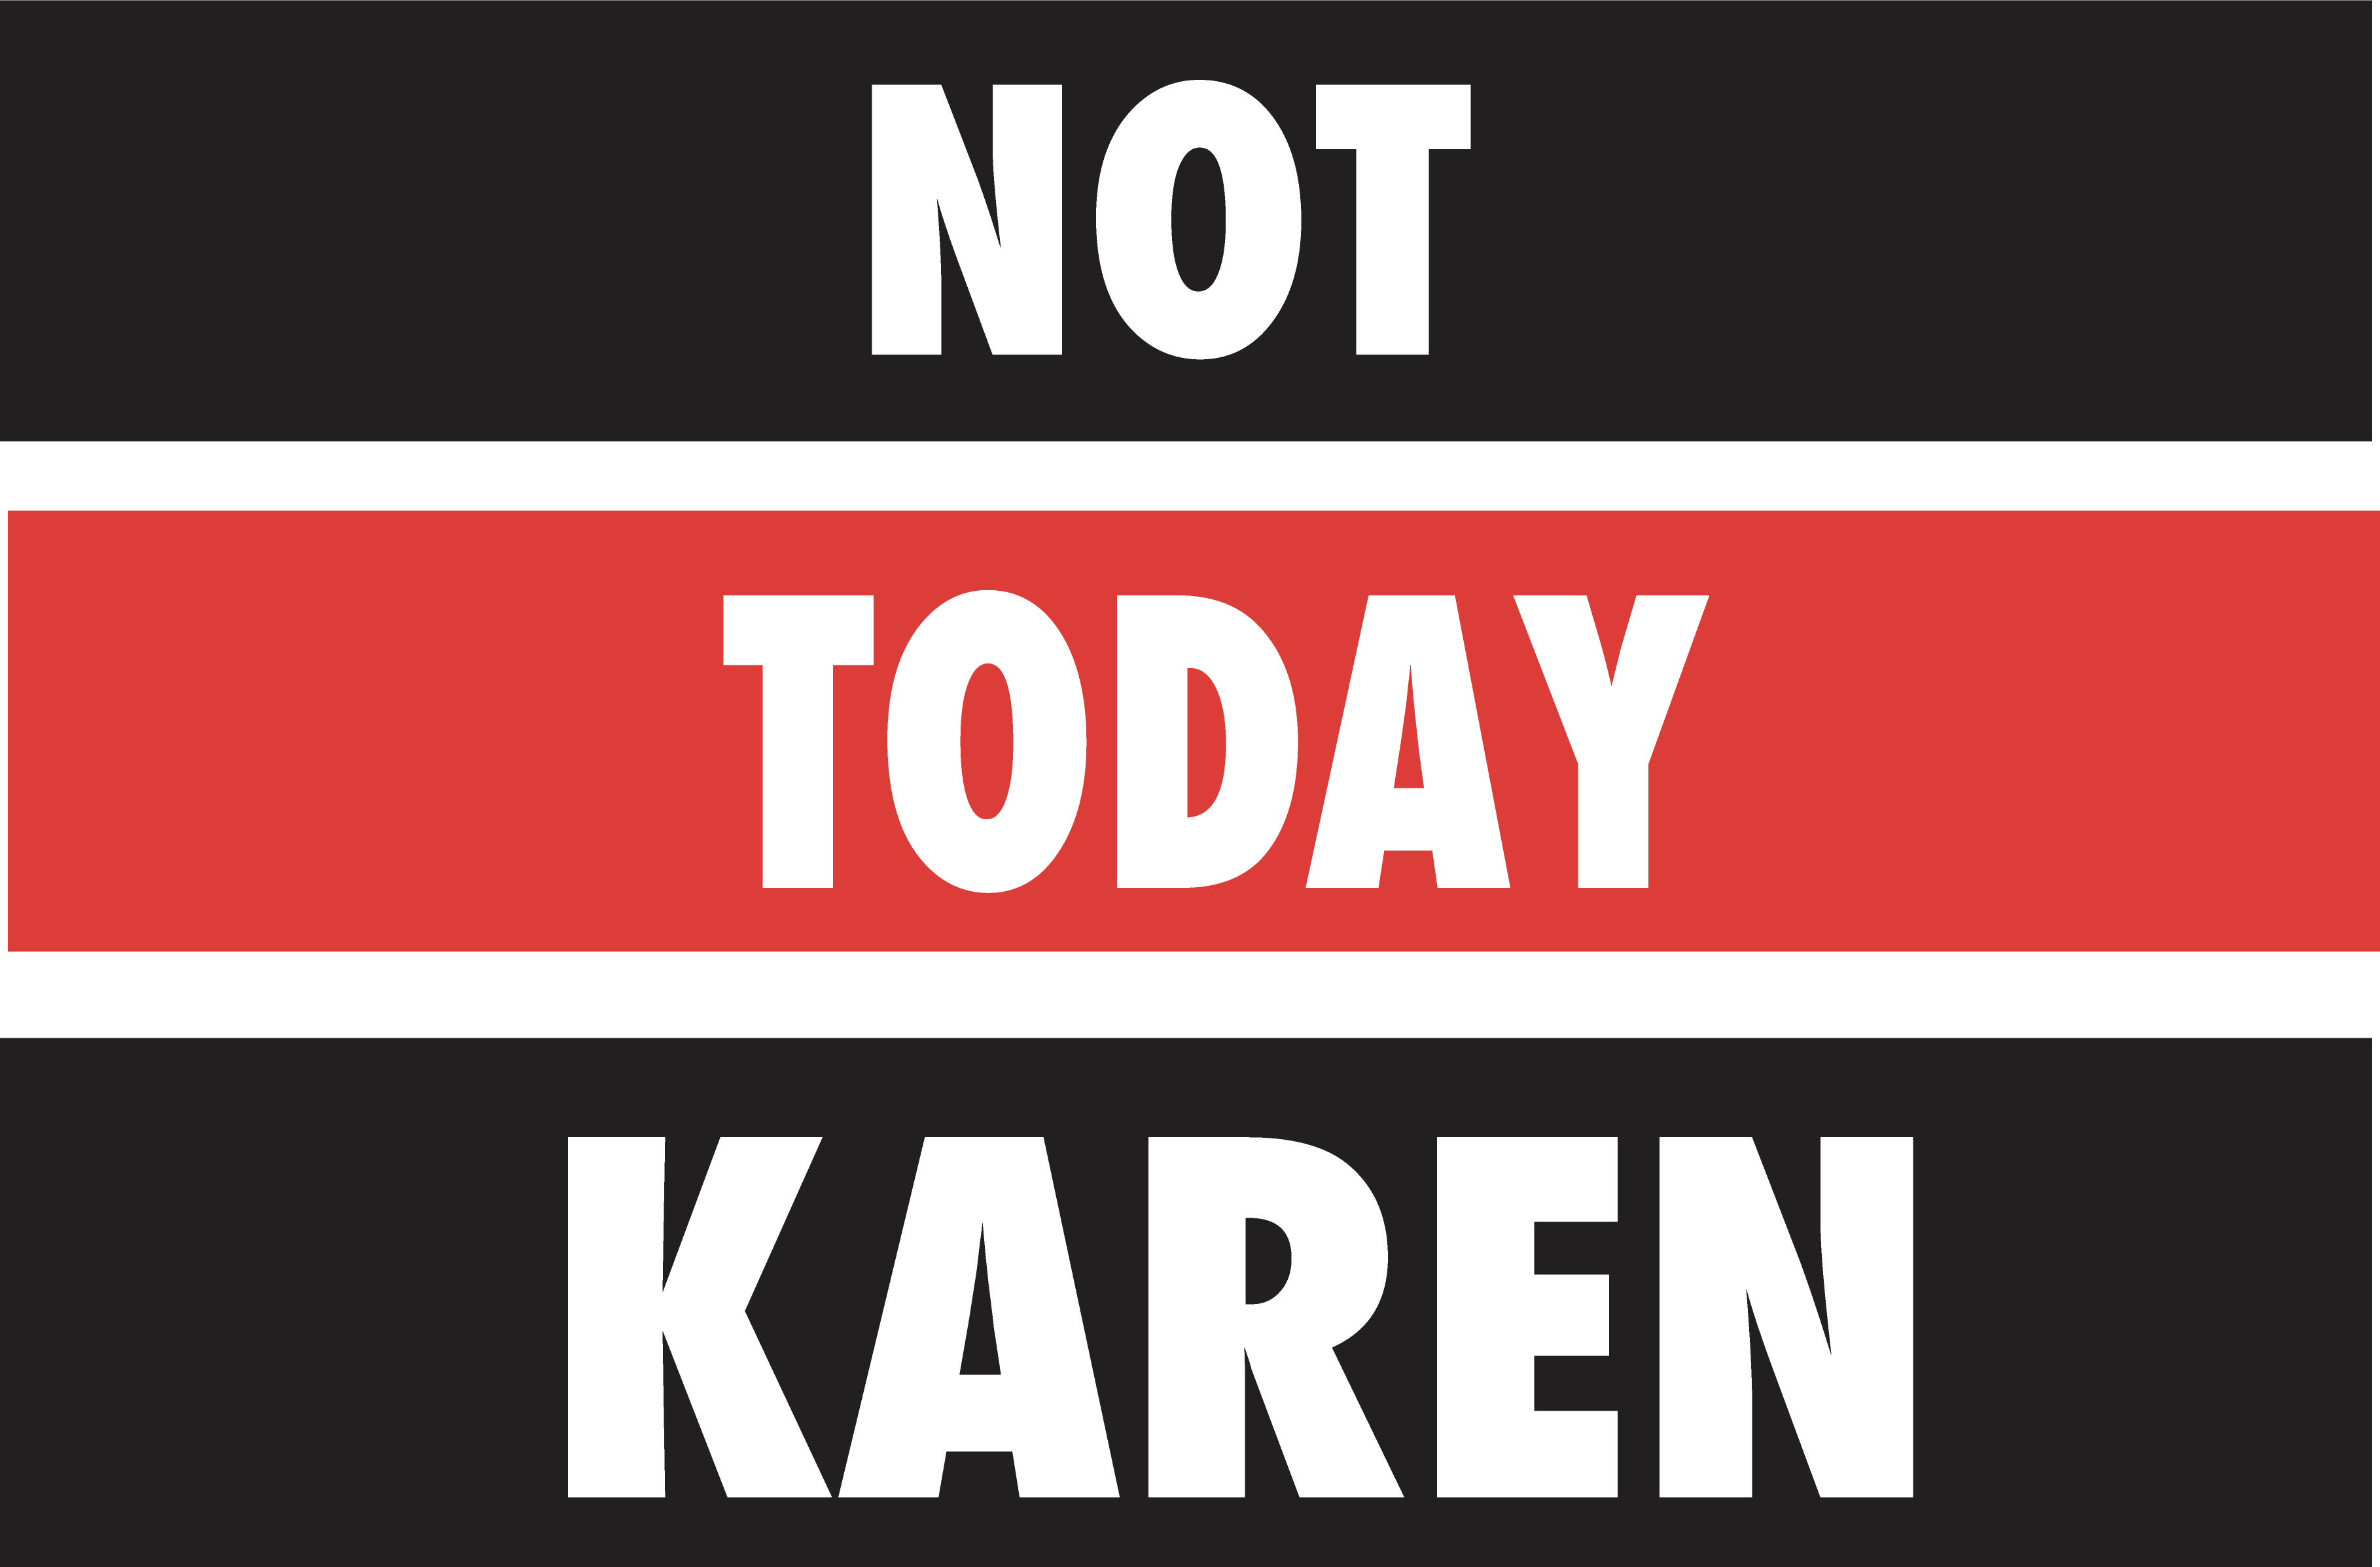 Download Not today karen SVG in 2020 | Silhouette machine, I wish ...